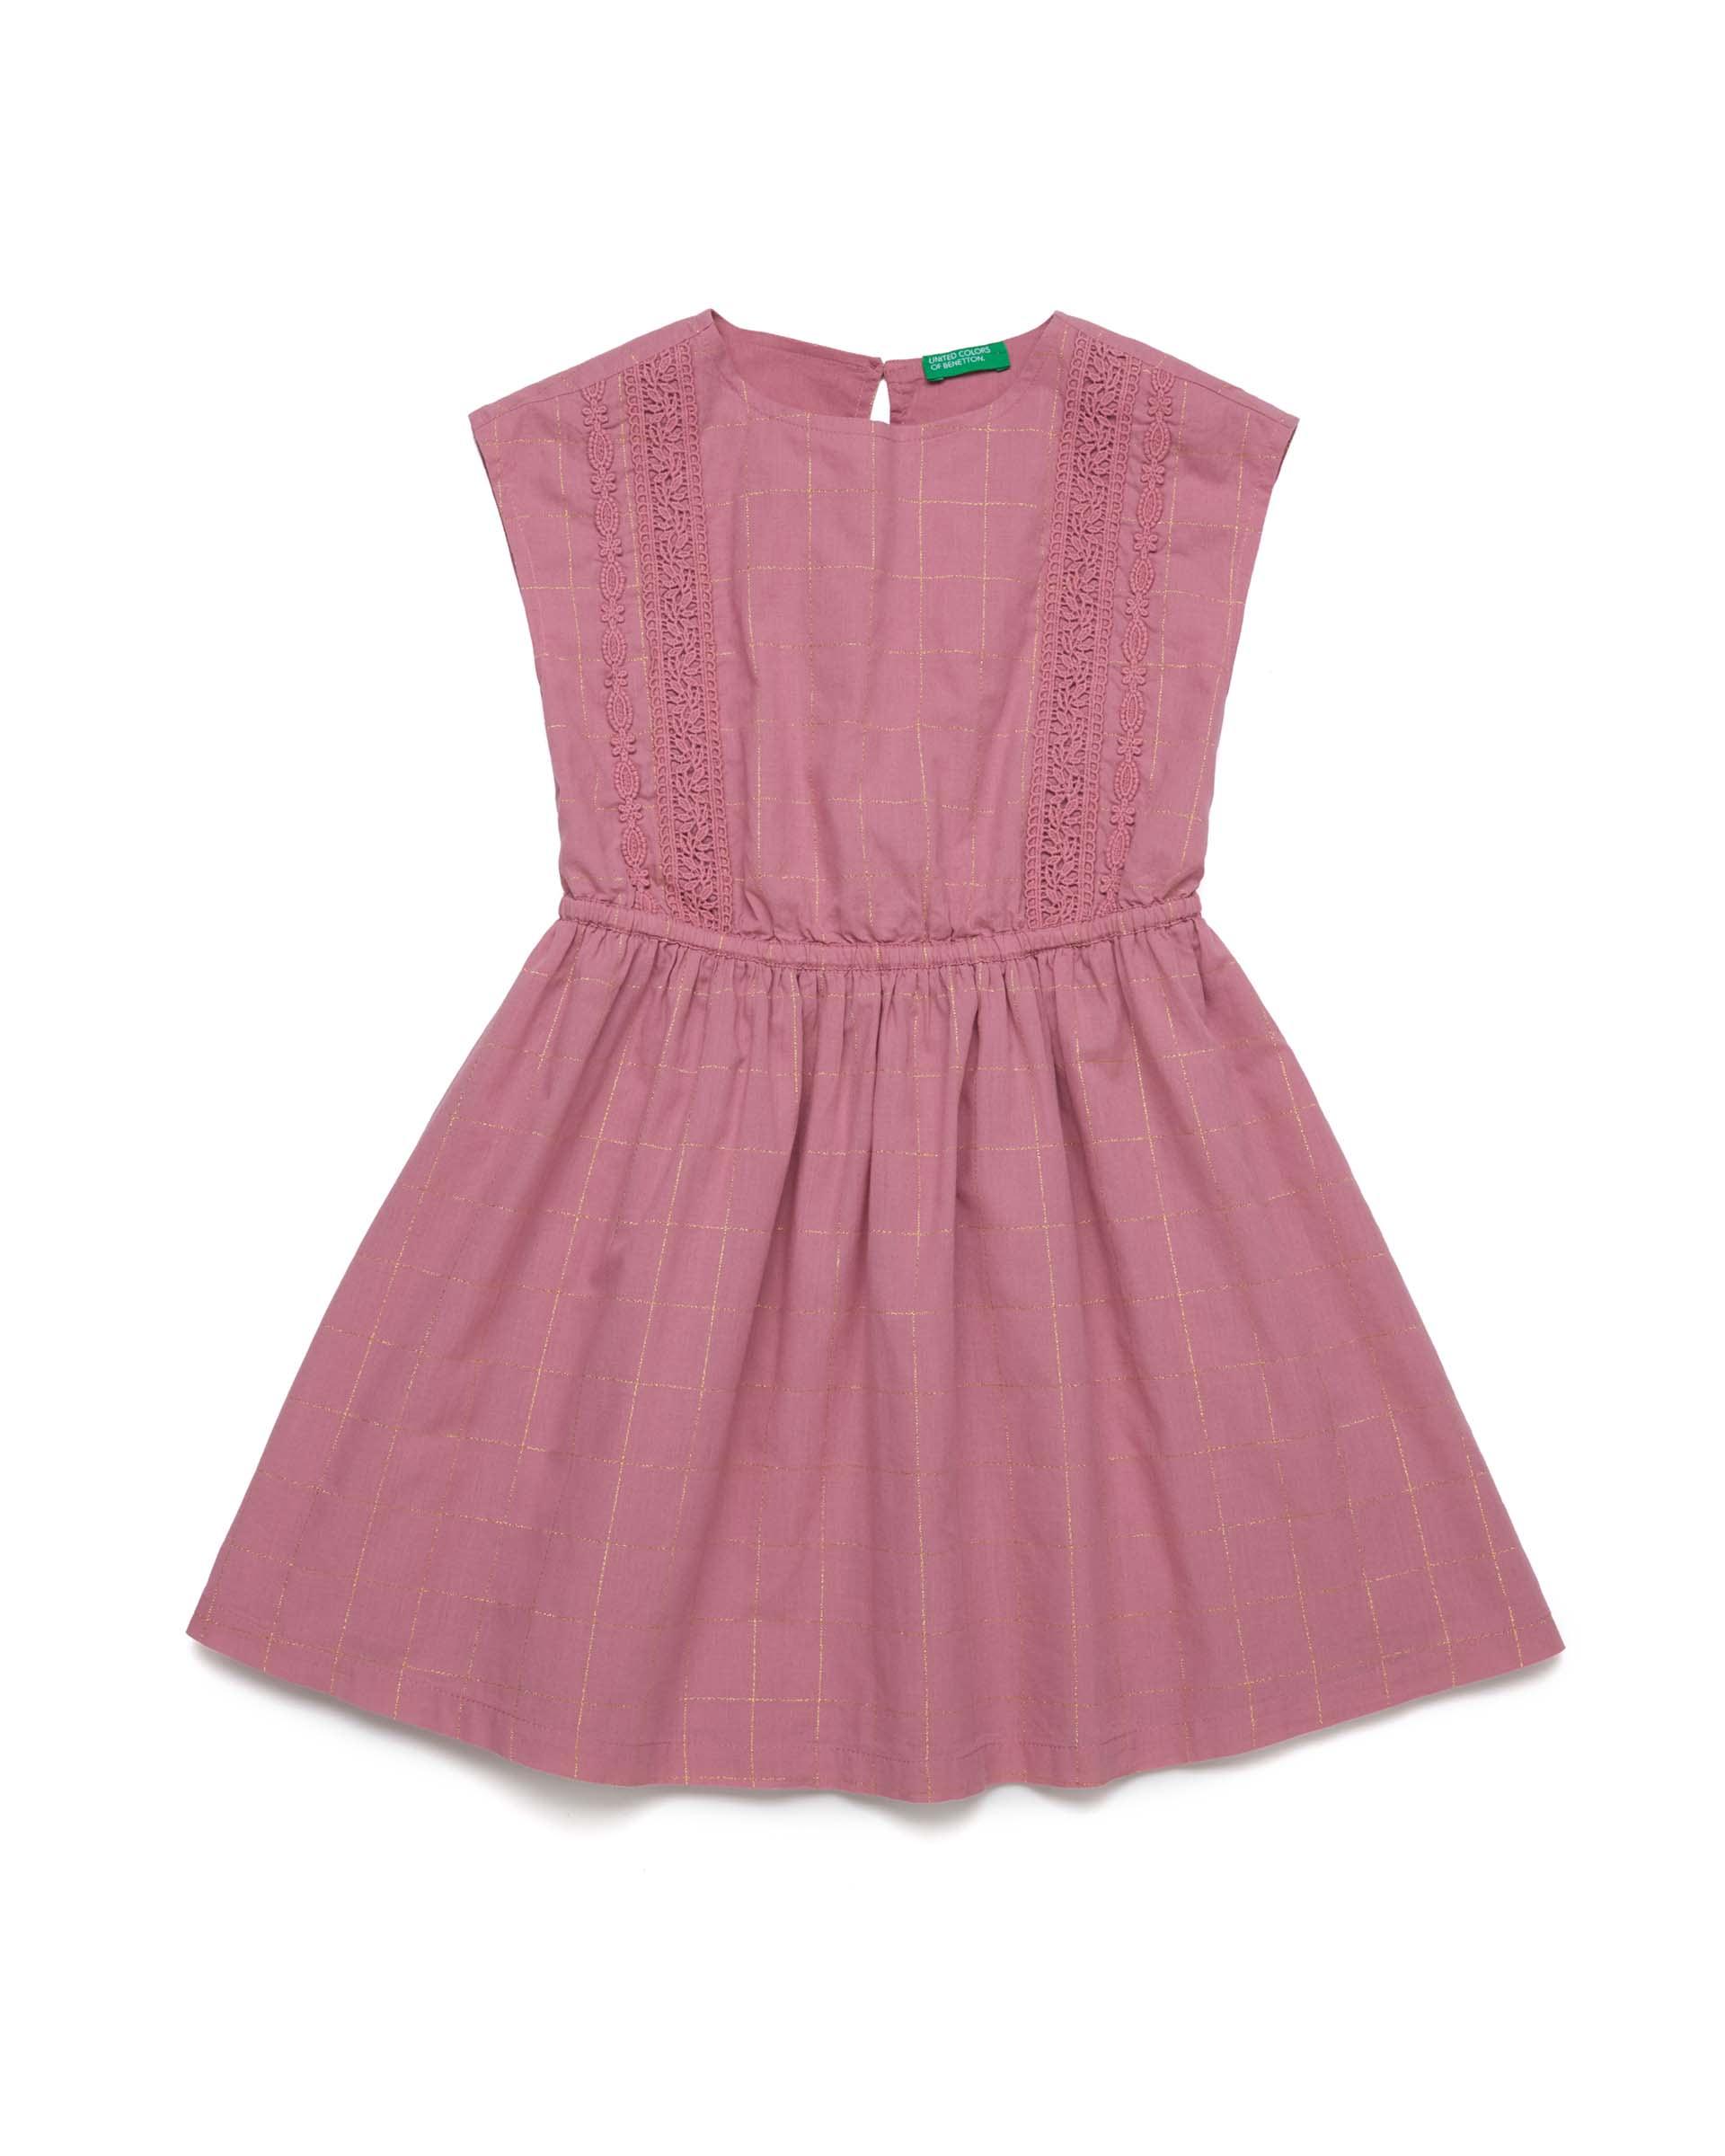 20P_4OV55VDH0_910, Платье для девочек Benetton 4OV55VDH0_910 р-р 128, United Colors of Benetton, Платья для девочек  - купить со скидкой